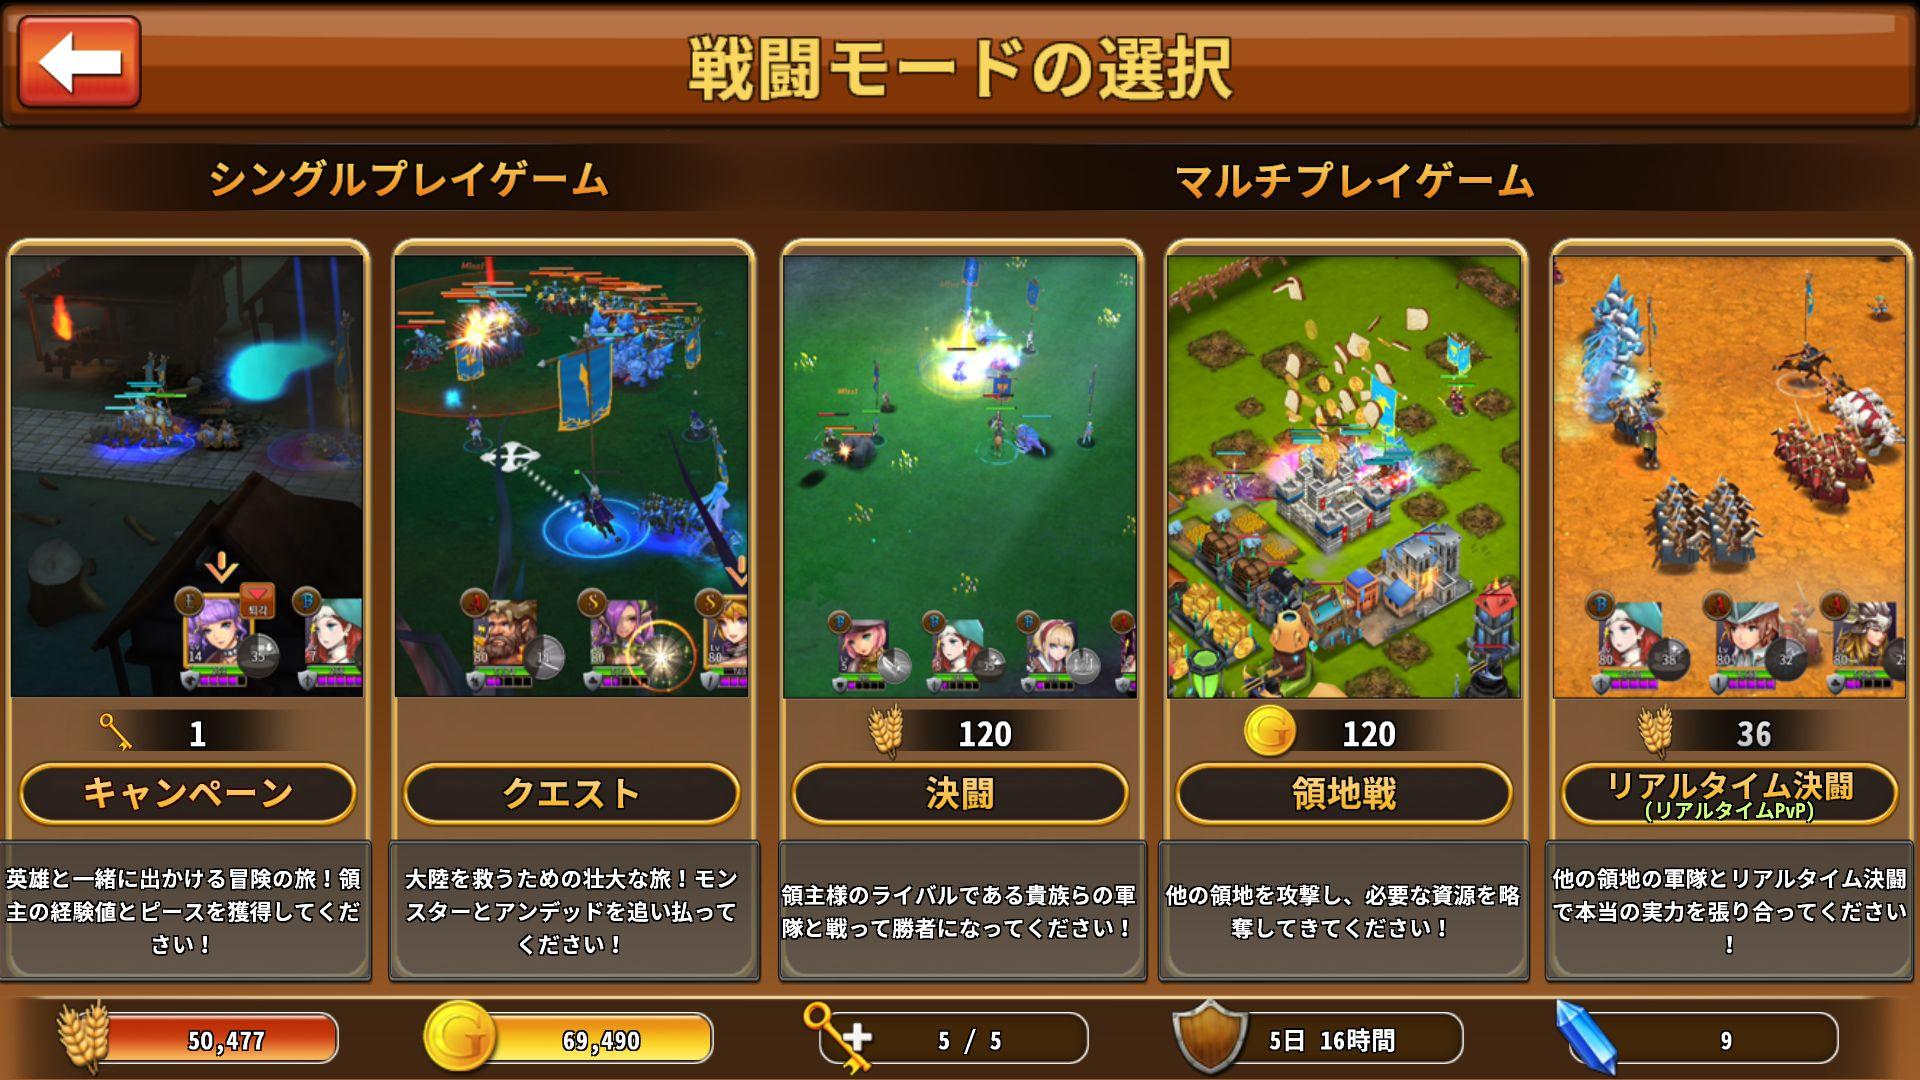 androidアプリ キングダムスレイヤー(Kingdom Slayer)攻略スクリーンショット3